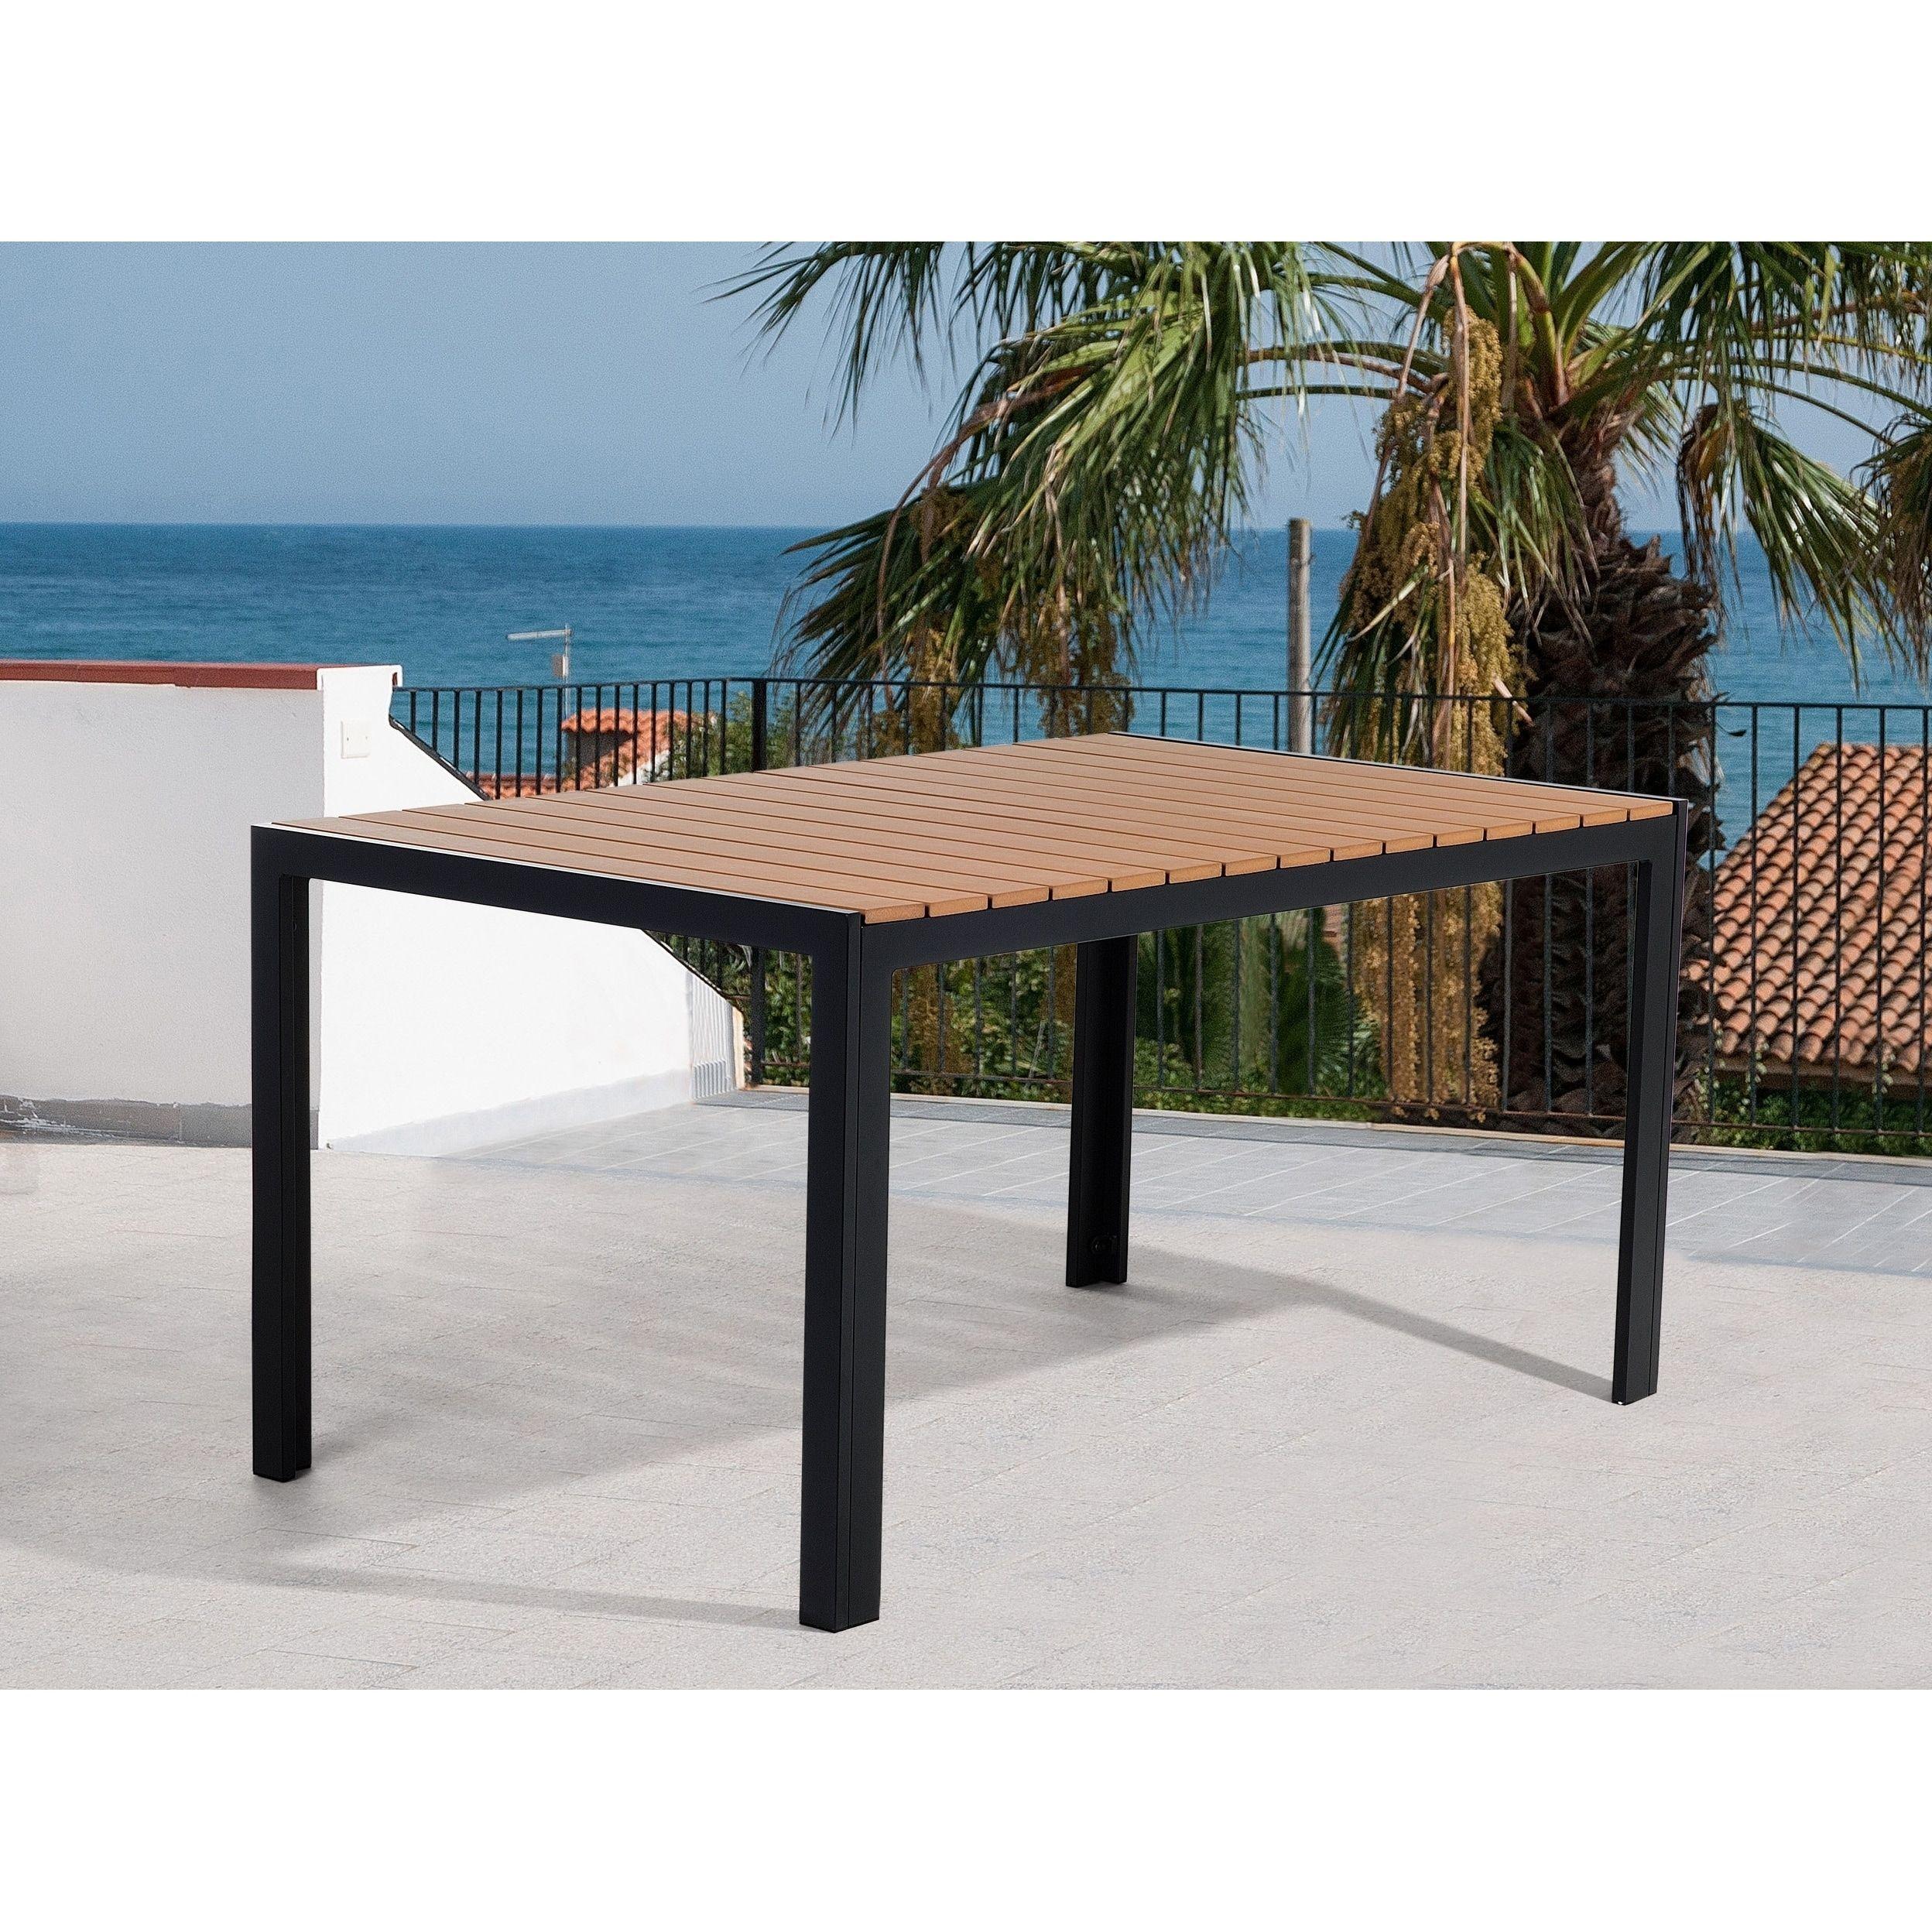 Beliani poly resin patio dining table como brown patio furniture